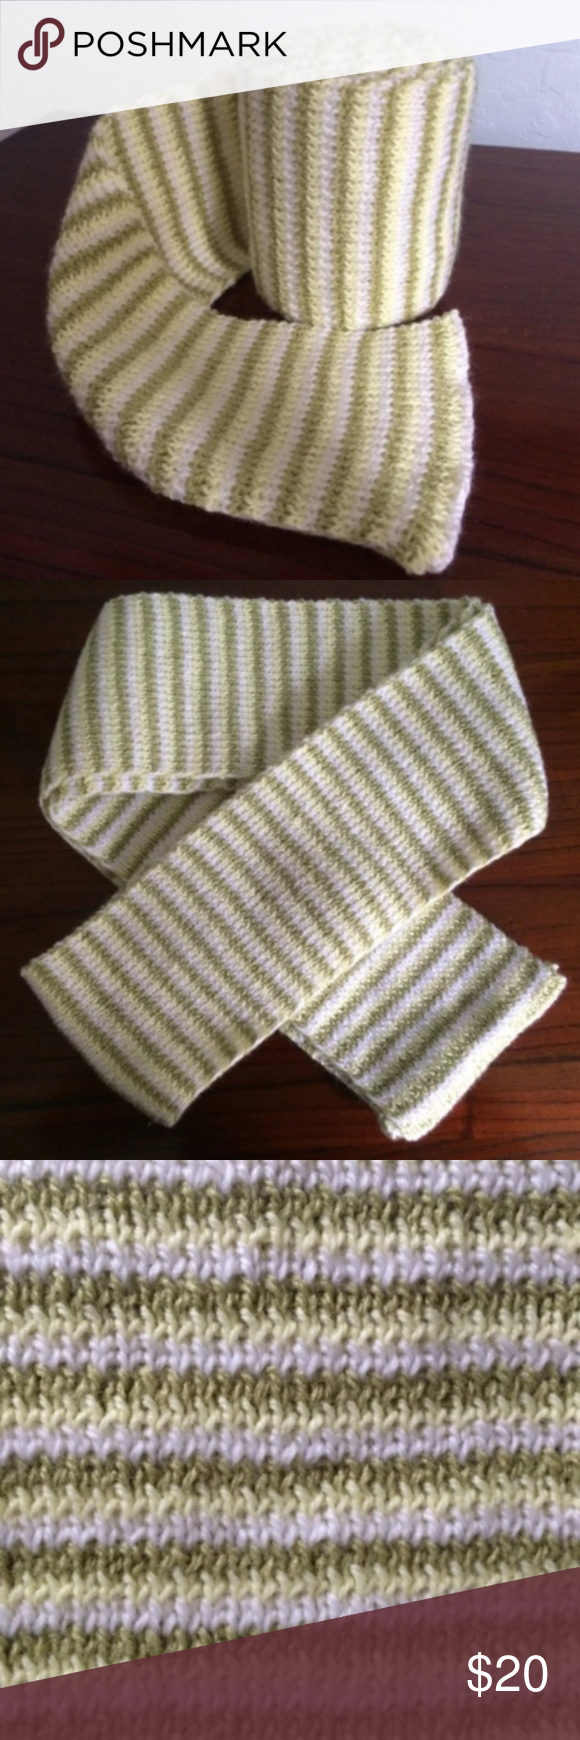 Photo of Handmade Meadow Stripe Knit Scarf Material: 100% acrylic yarn Color: white, lemo…